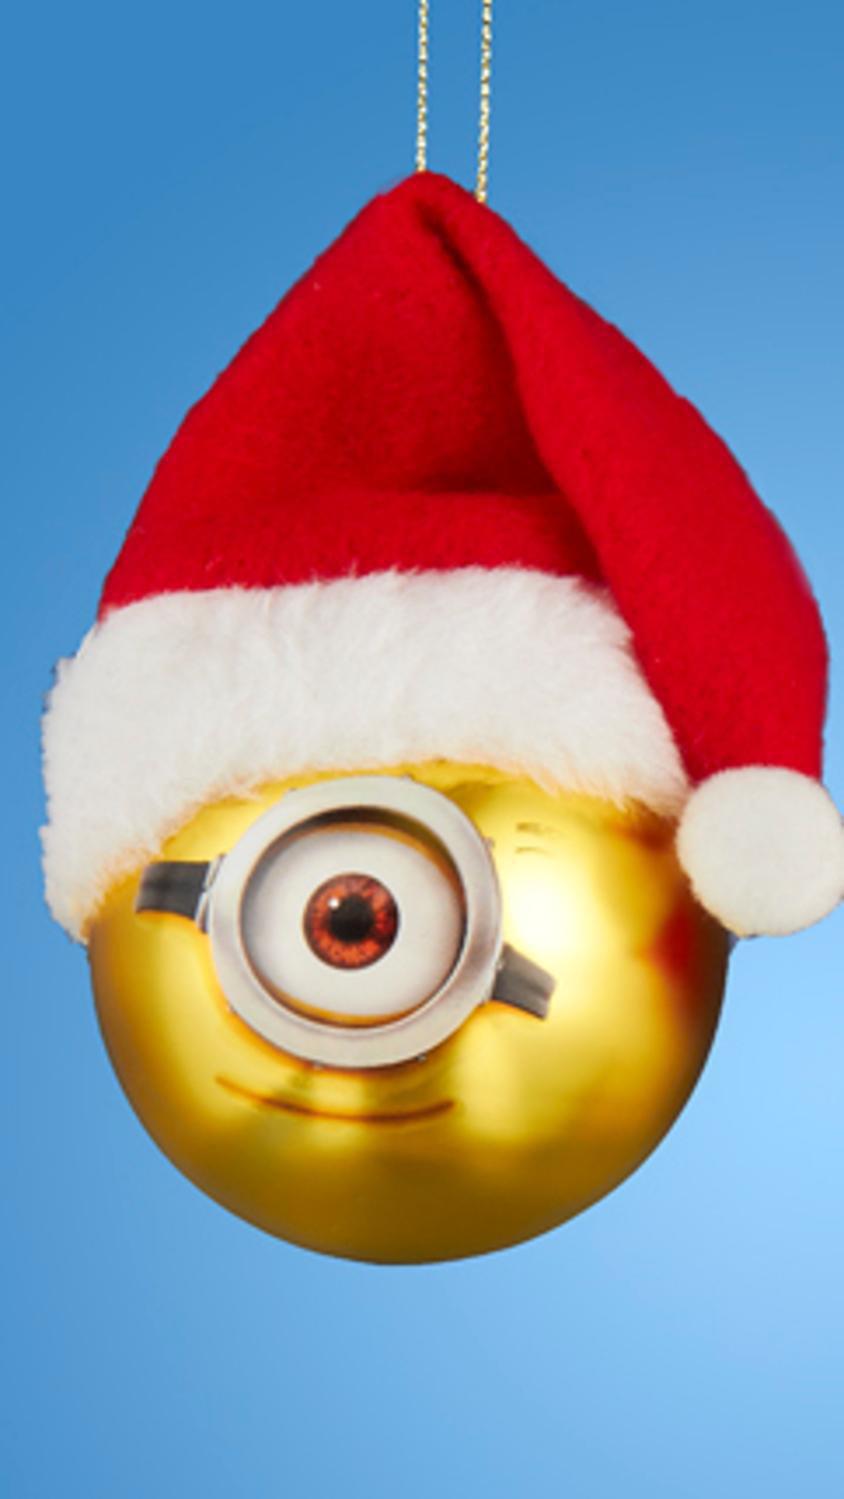 despicable me minion stuart with santa hat gold glass christmas ball ornament 25 60mm - Minion Christmas Ornaments